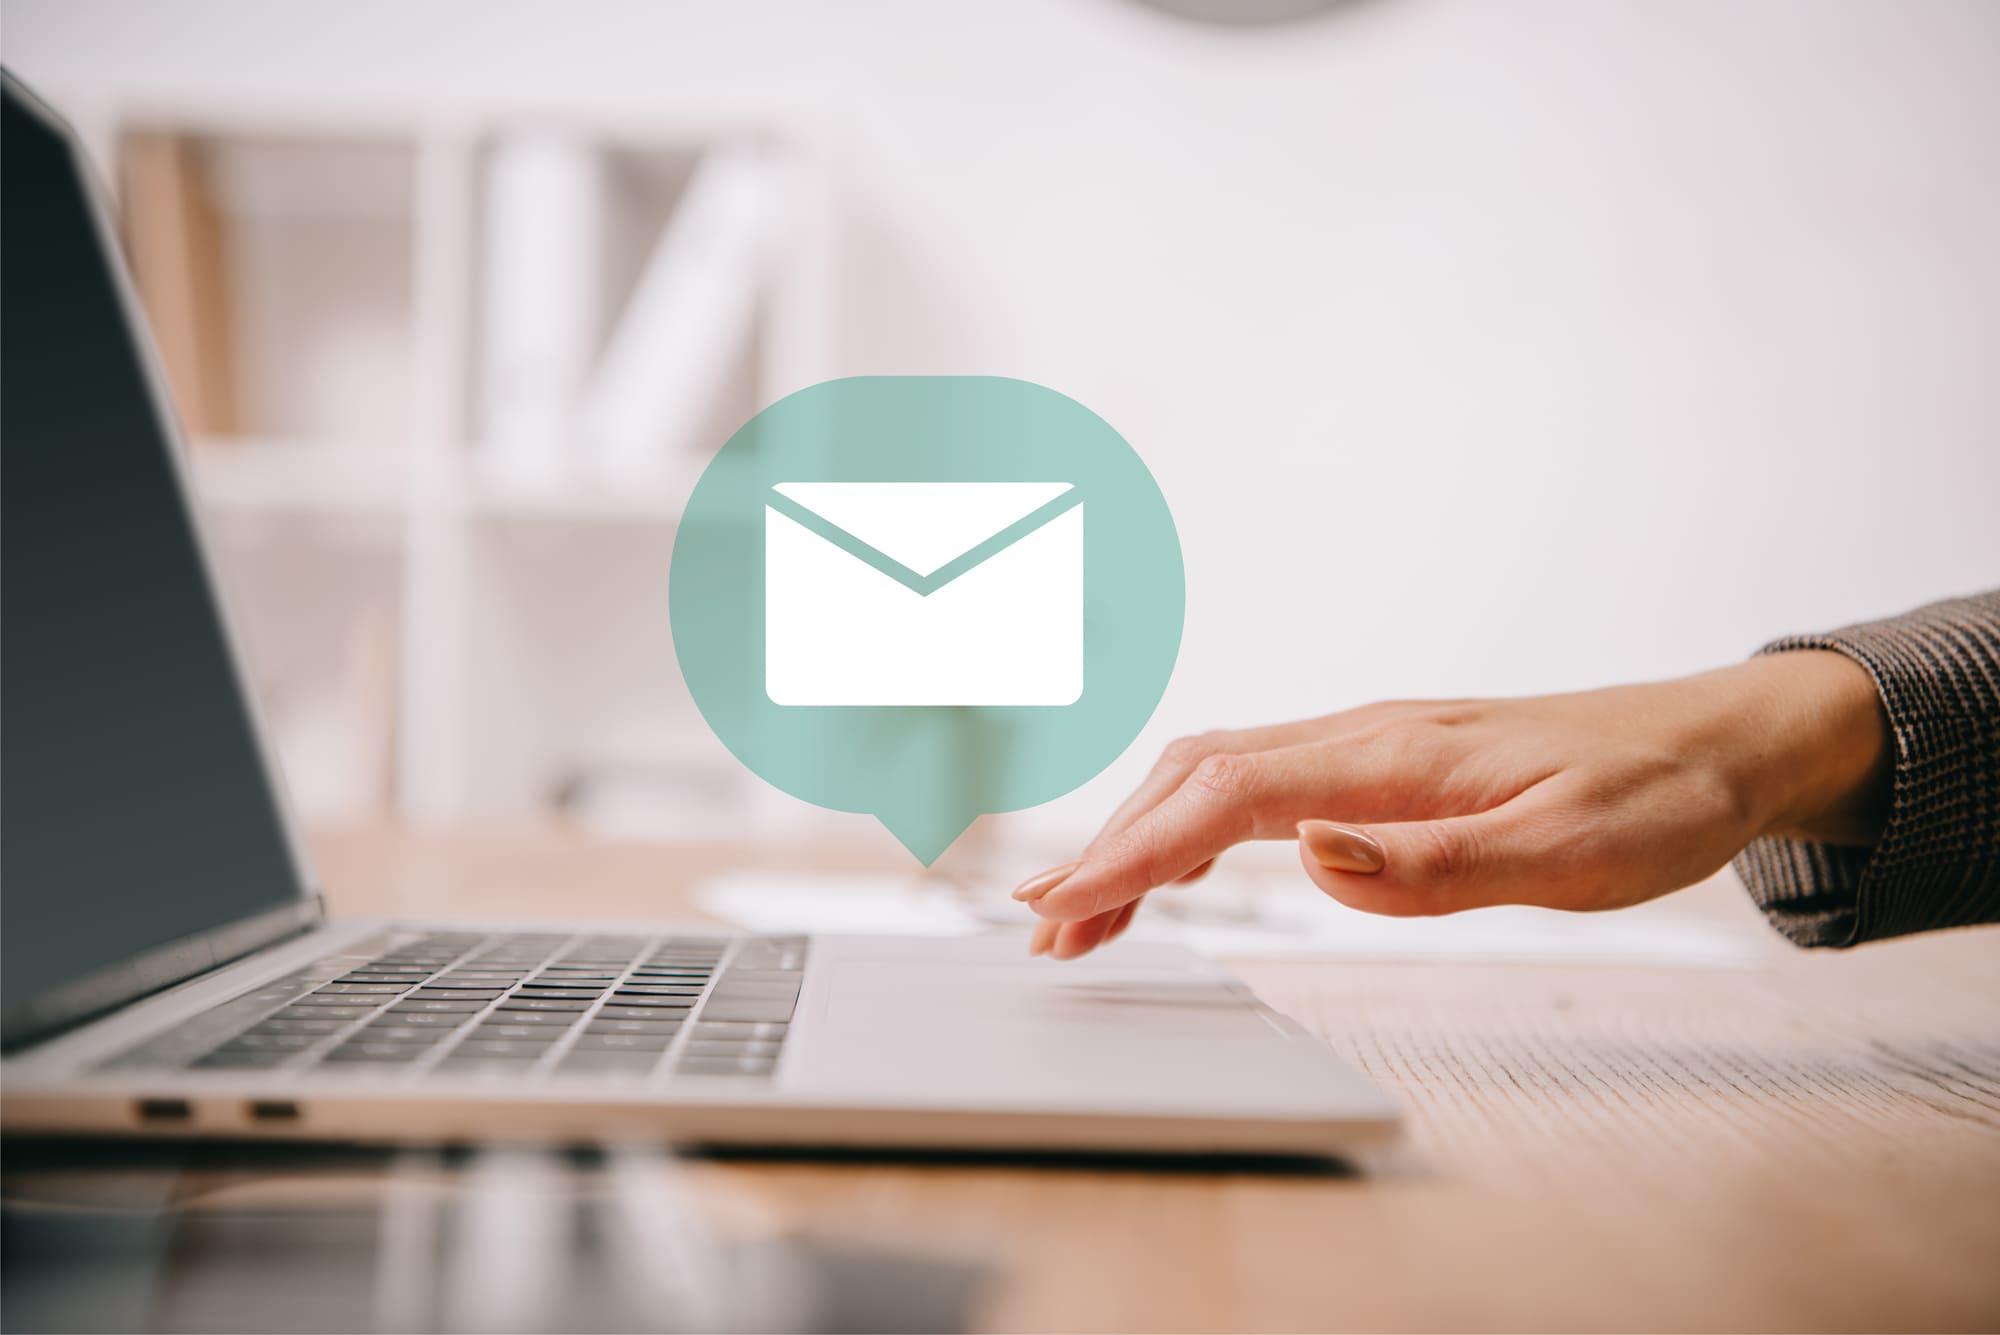 email marketing strumenti